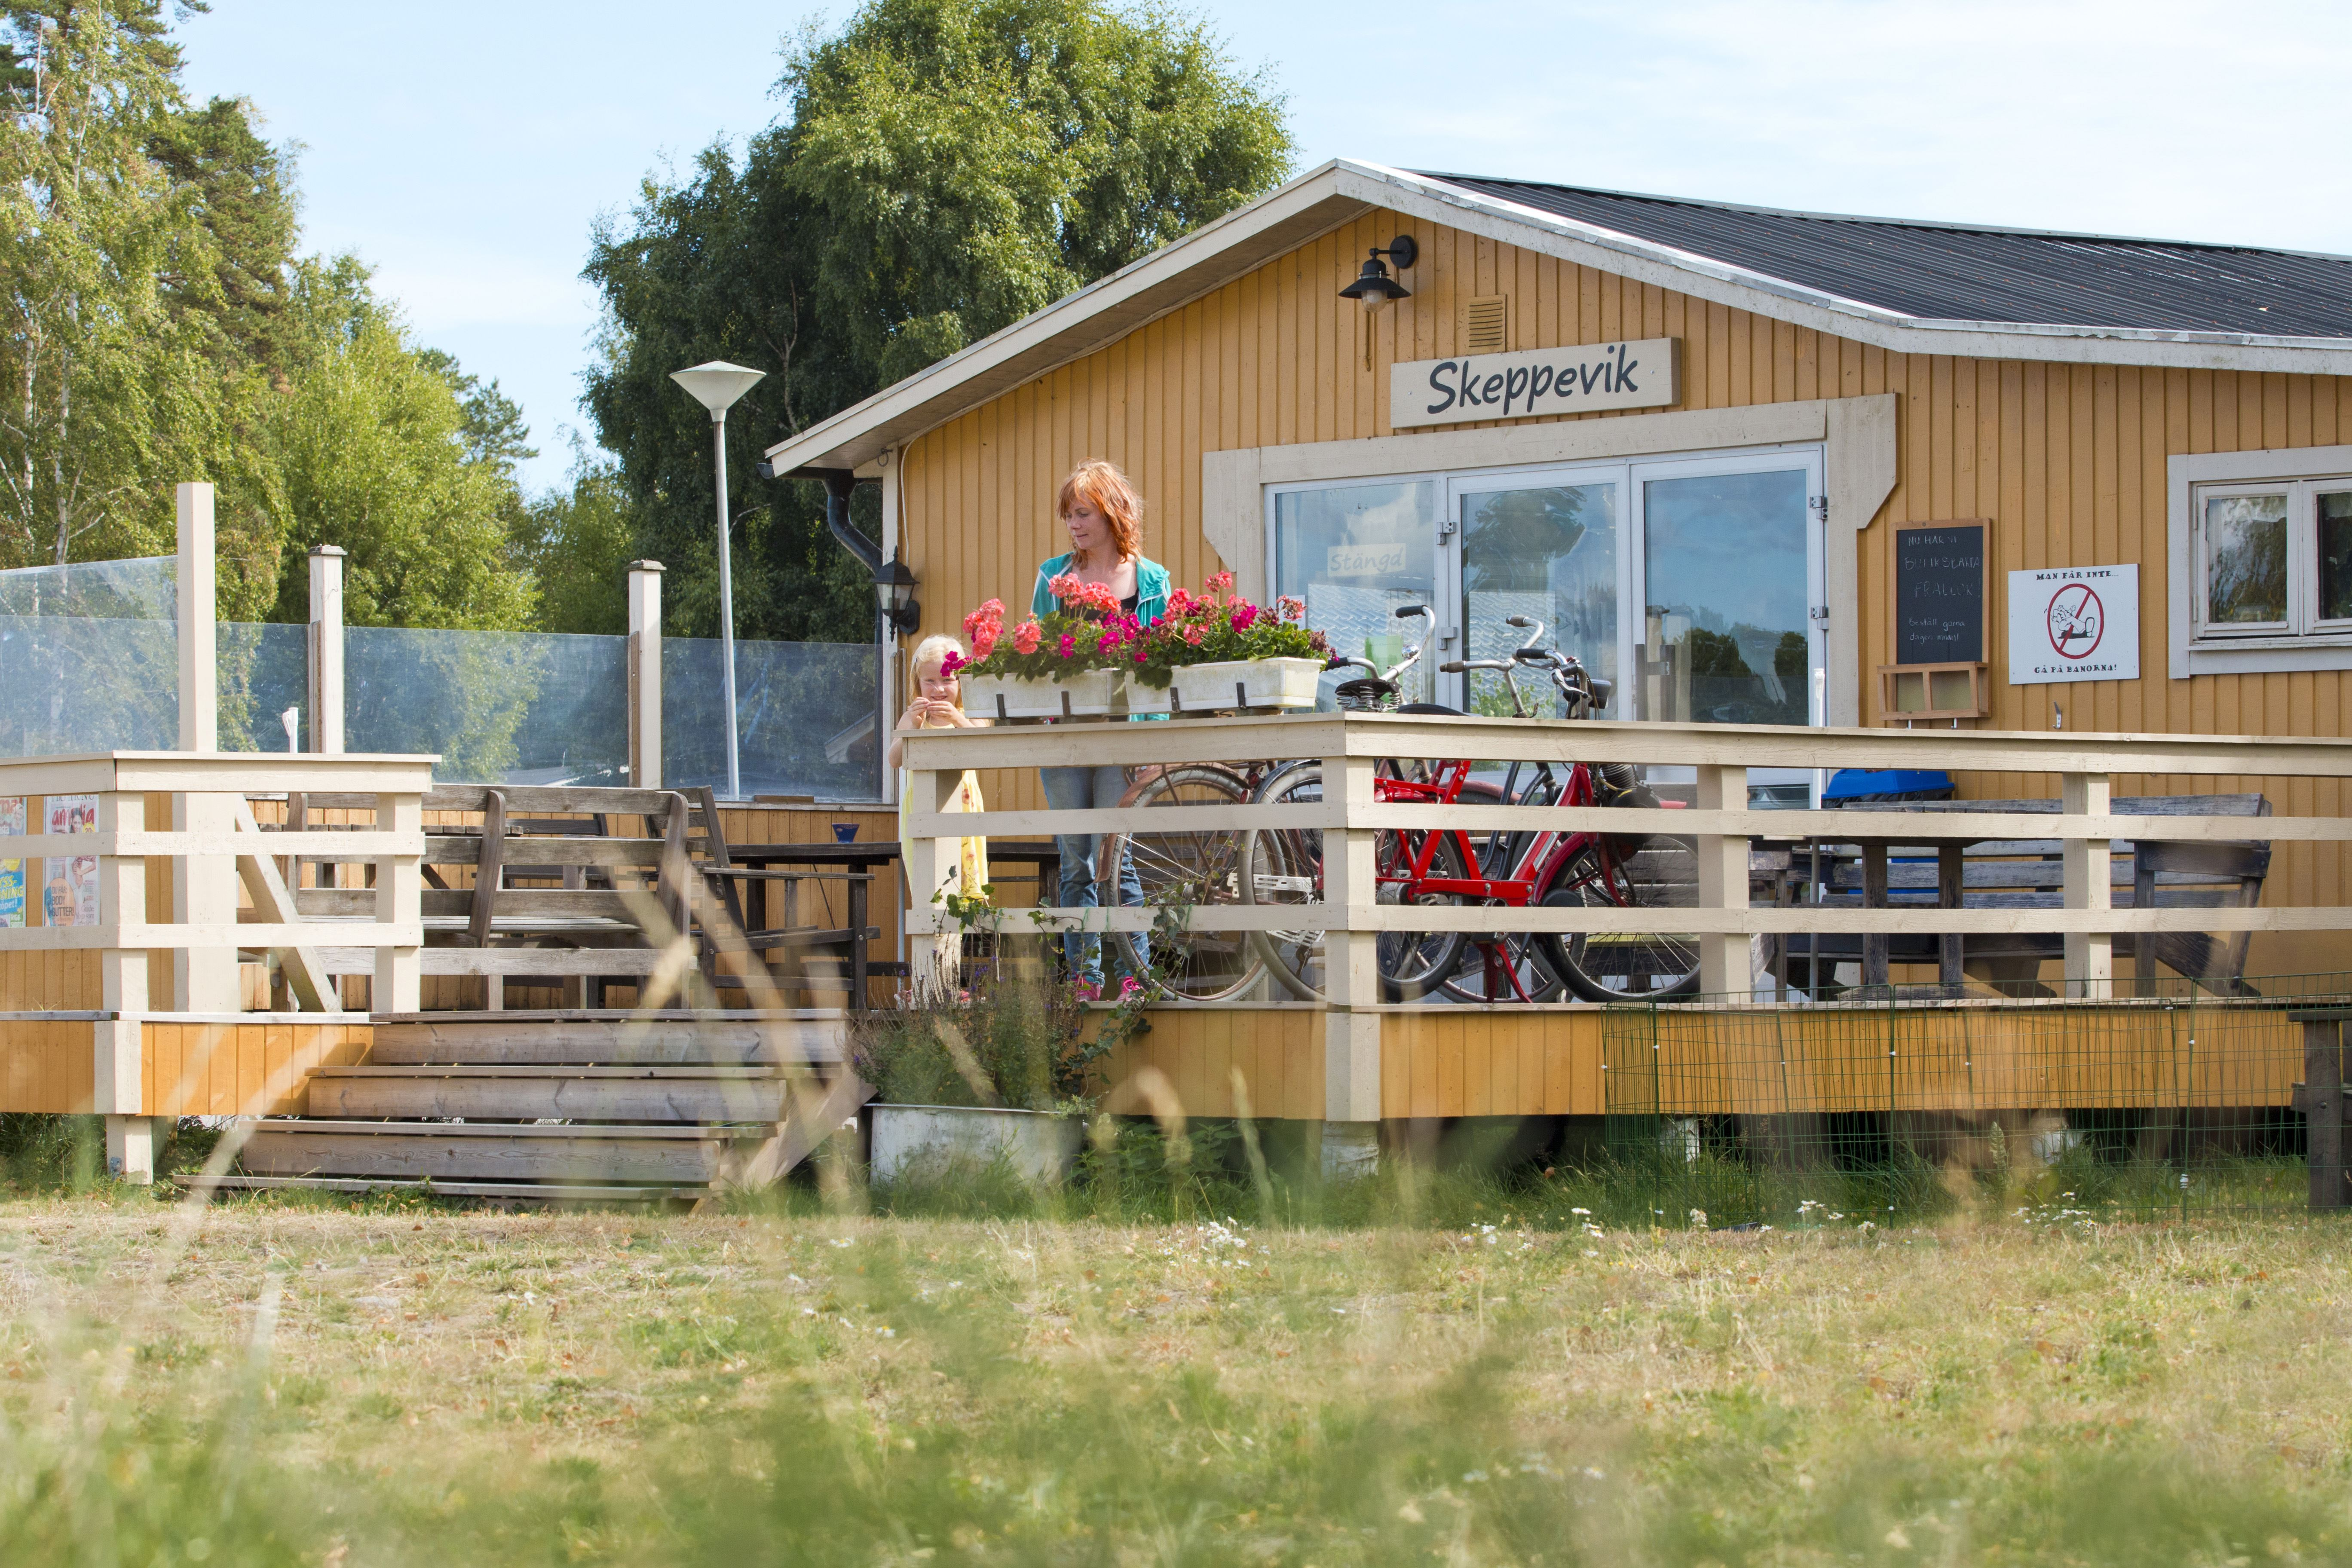 Skeppeviks Café